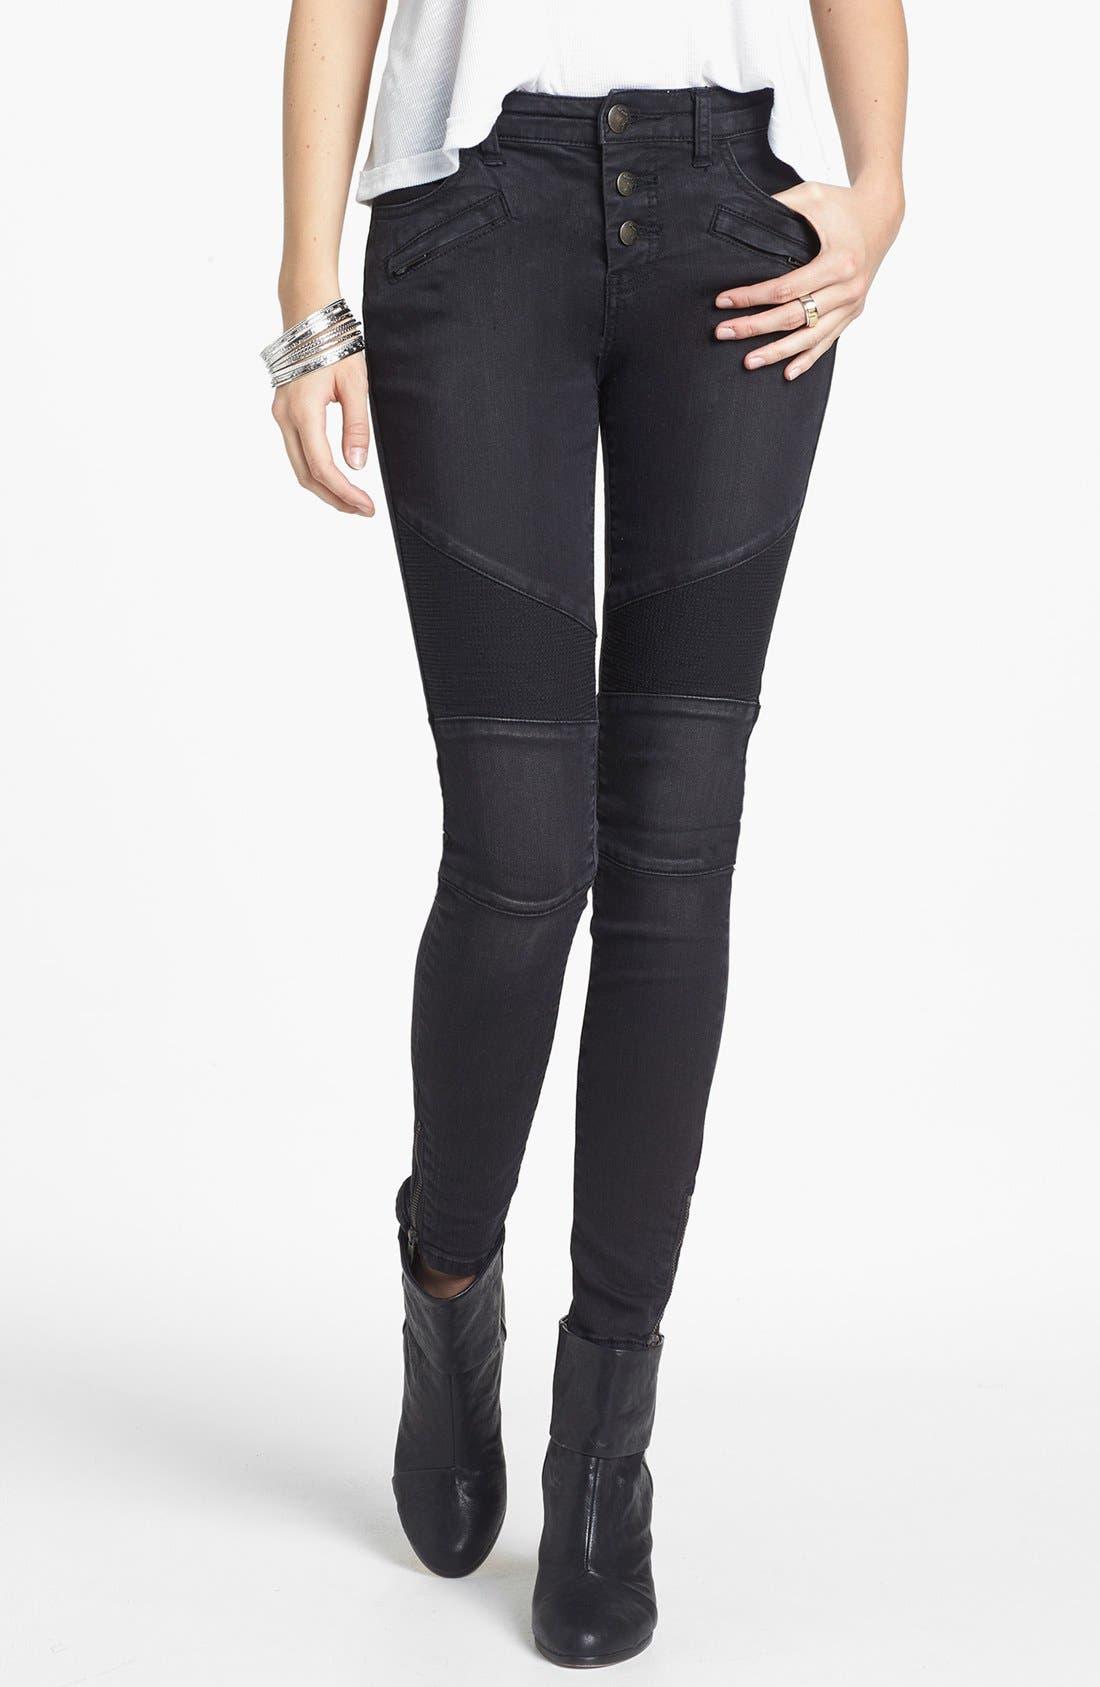 Alternate Image 1 Selected - Free People Seamed Moto Skinny Jeans (Moonlight)